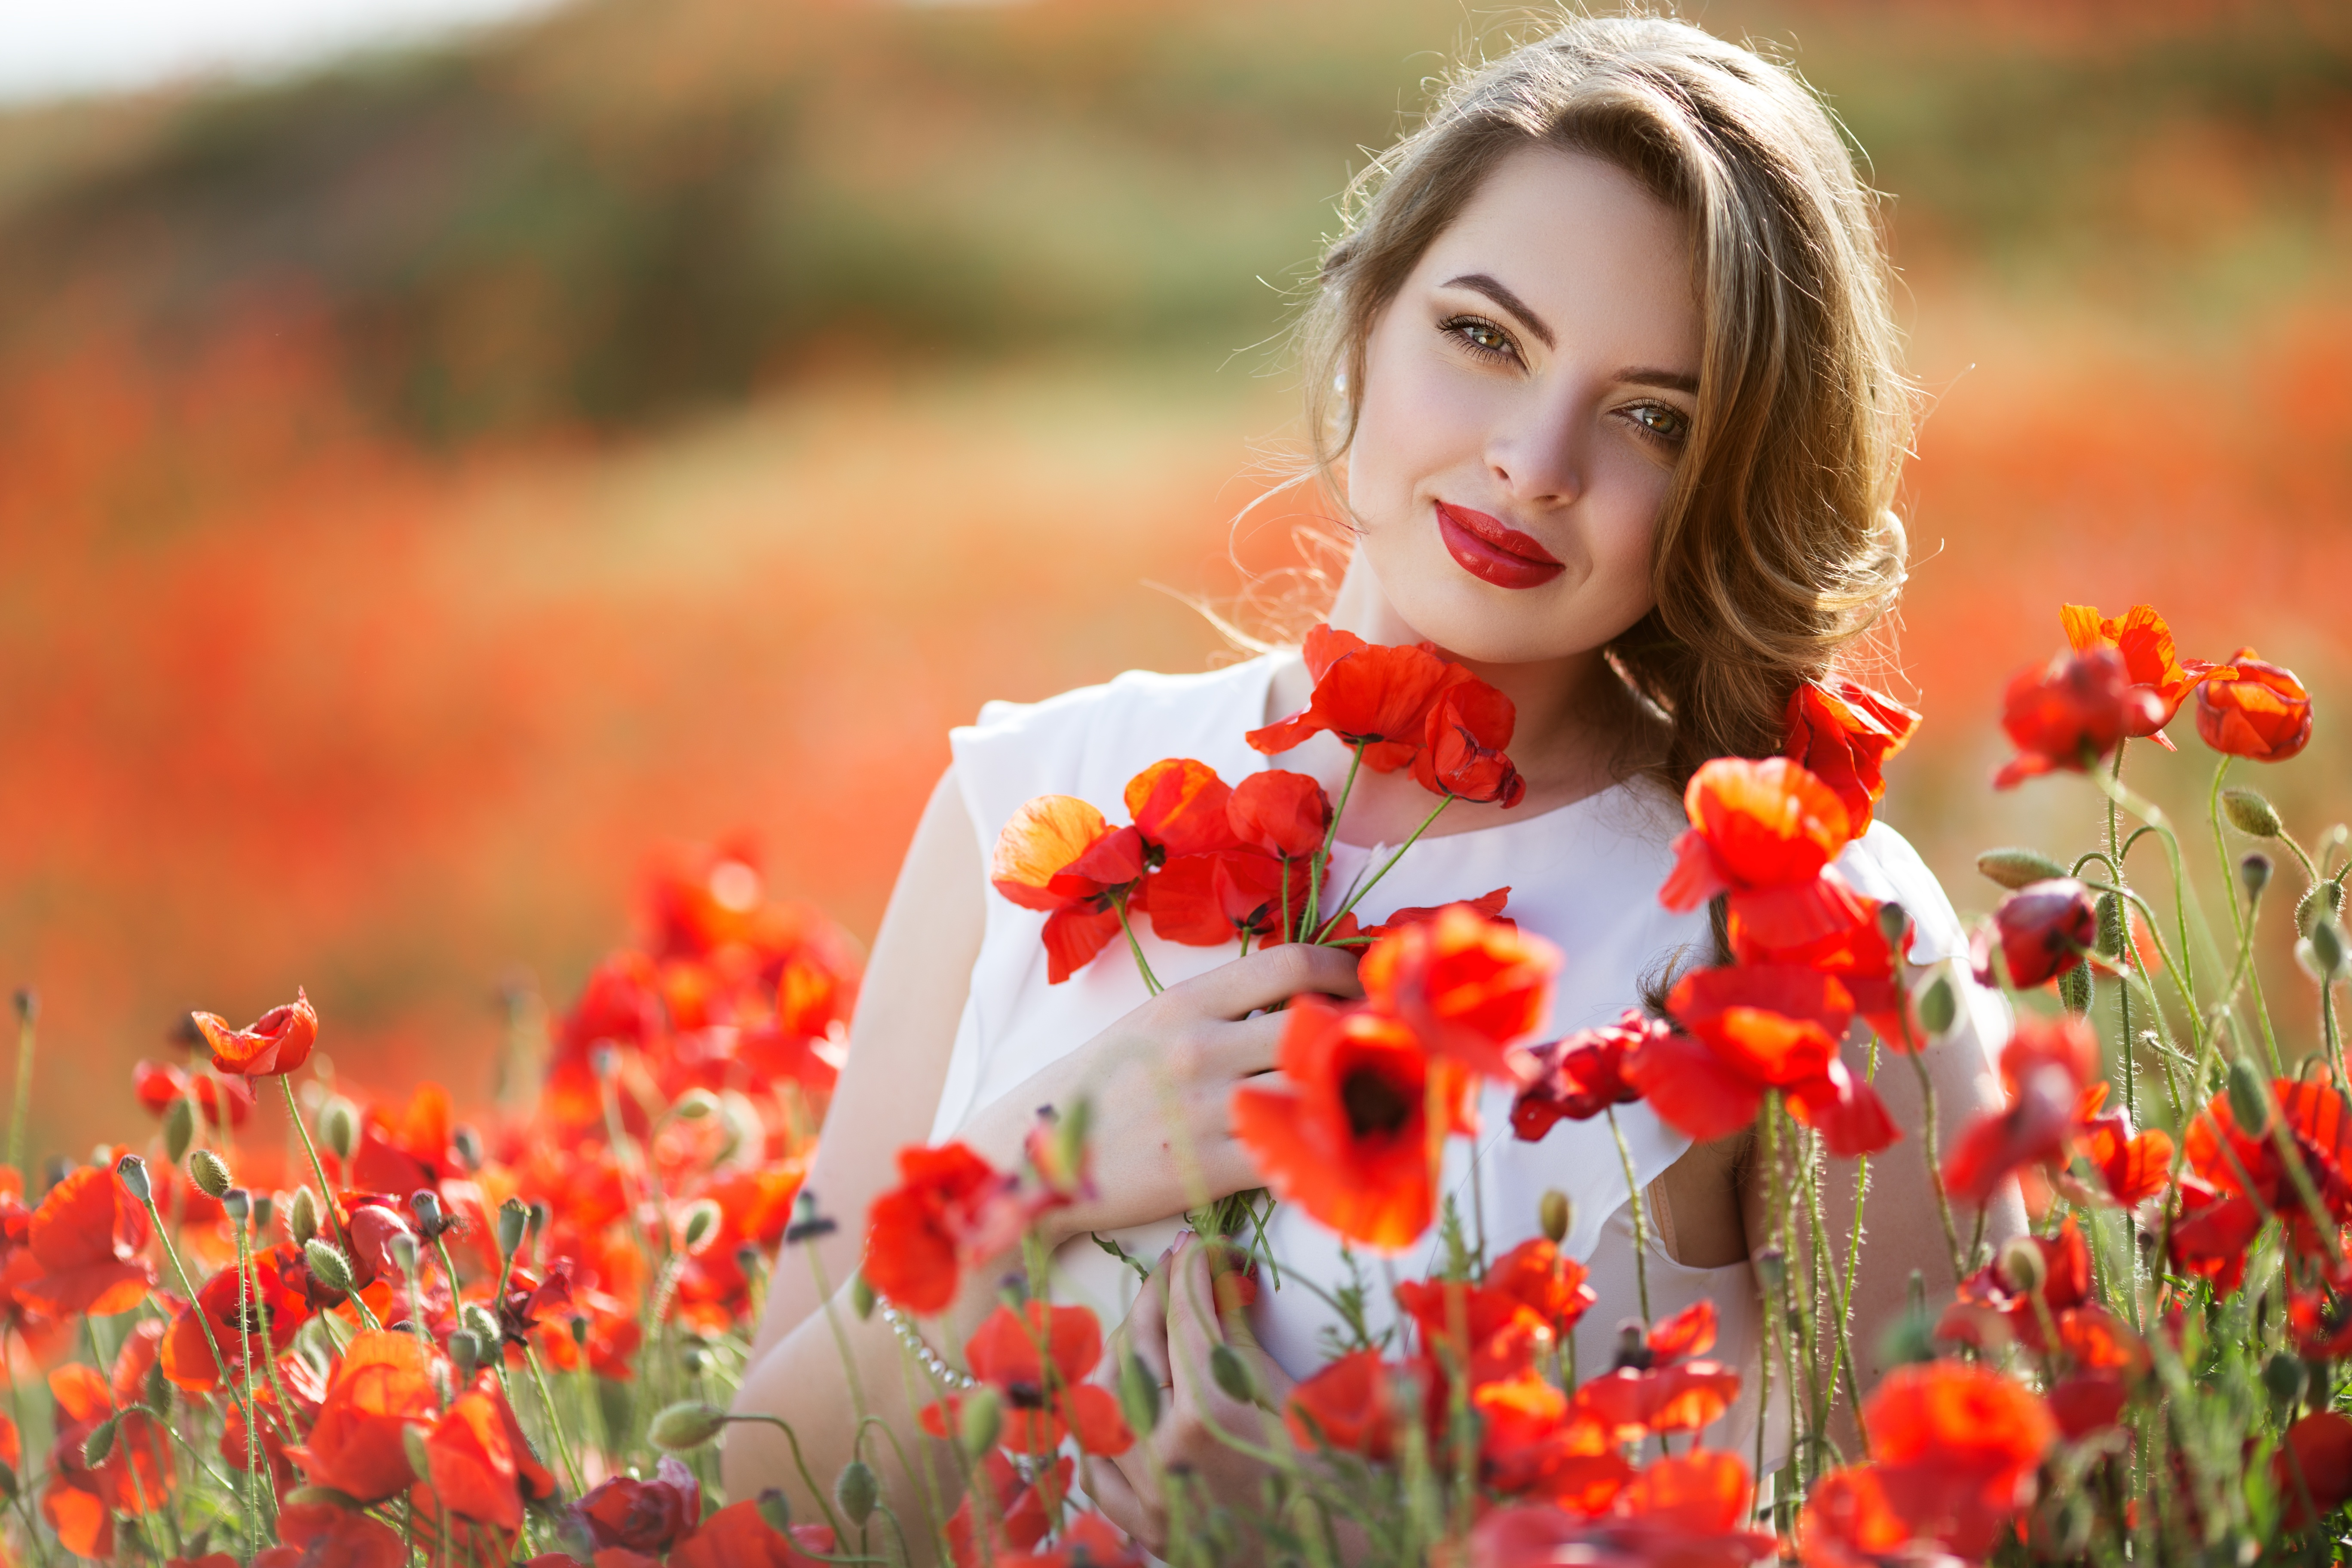 Картинка девушка с цветком в руках, милиции картинки